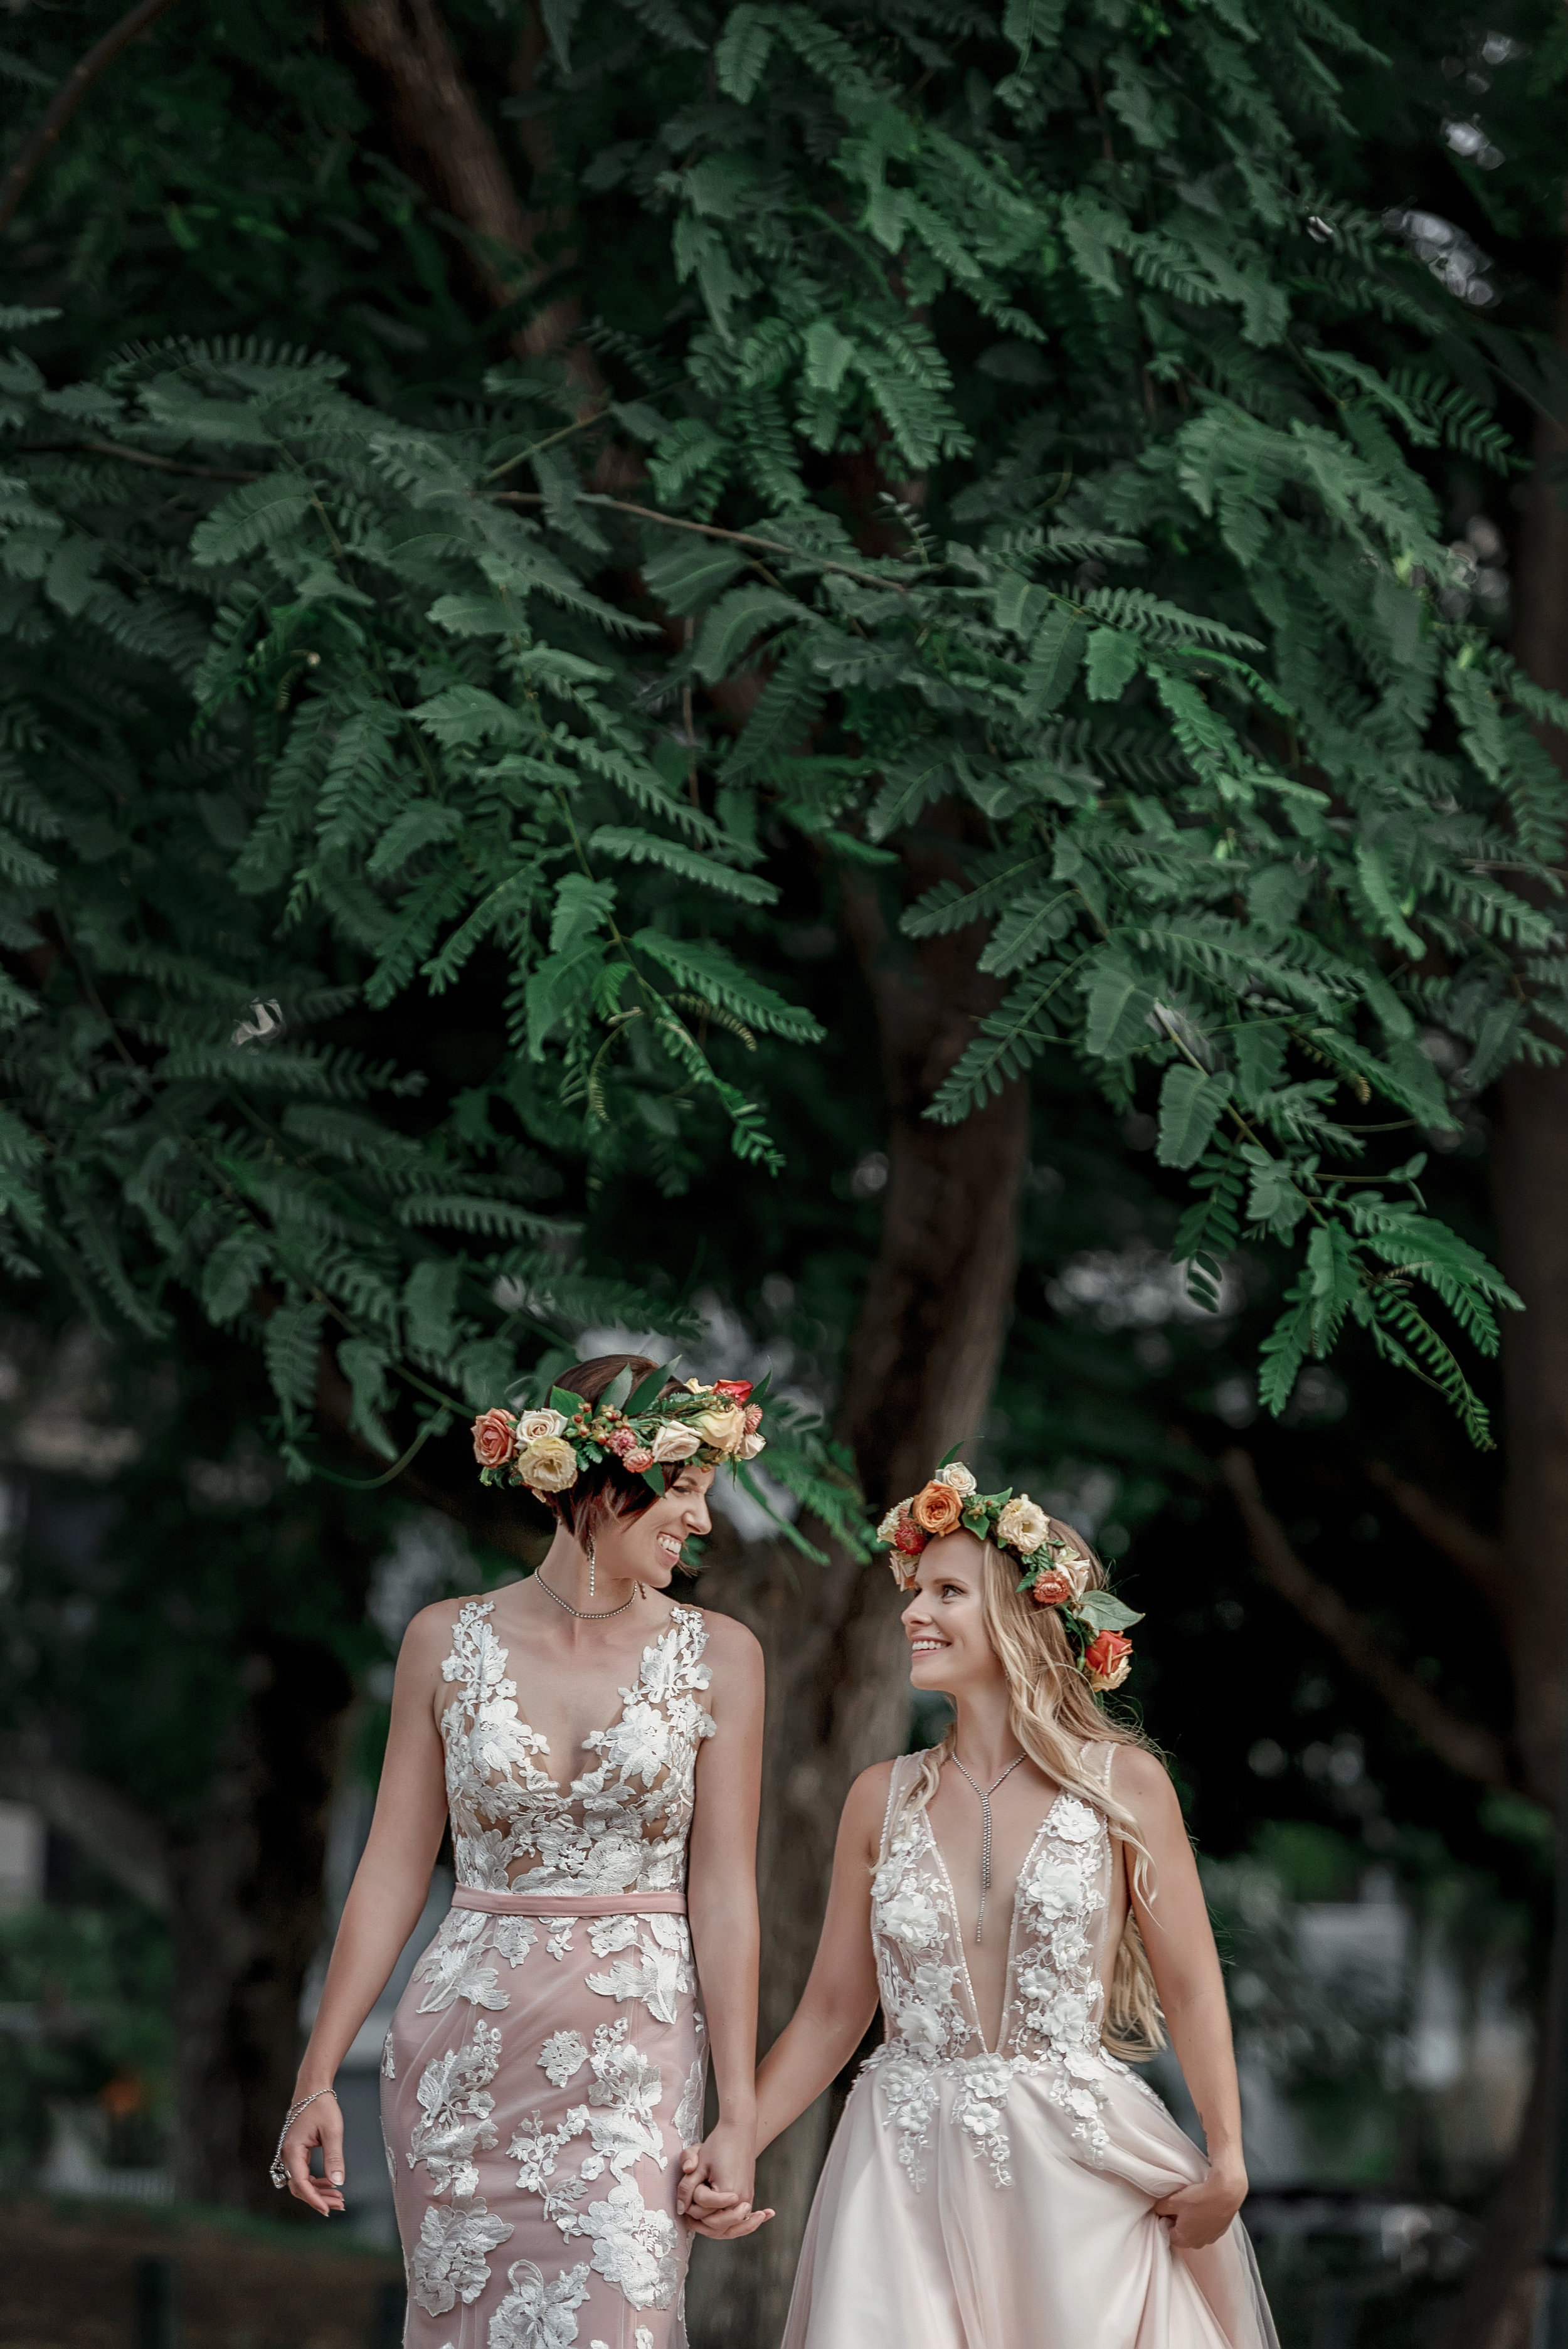 Elegant Bridal Photoshoot Floral Crowns Two Brides Lace Wedding Dress Brisbane